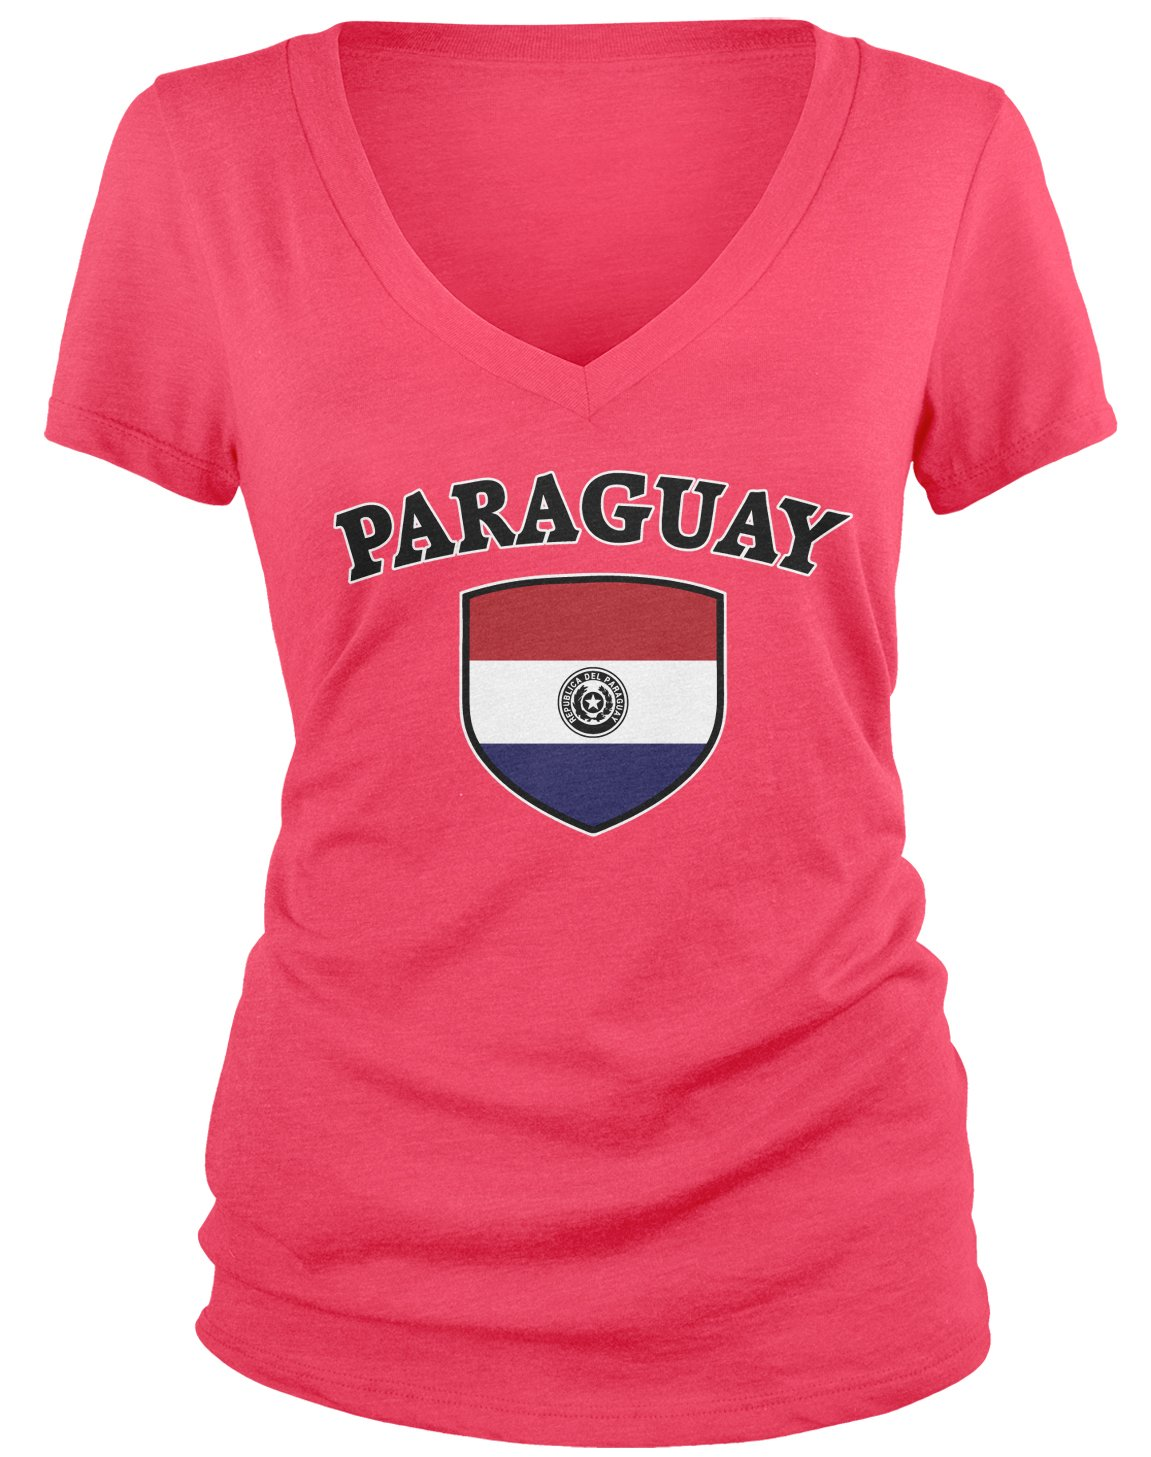 Amazon.com: Amdesco Juniors Paraguay Flag Shield, Paraguayan Pride V-Neck T-Shirt: Clothing